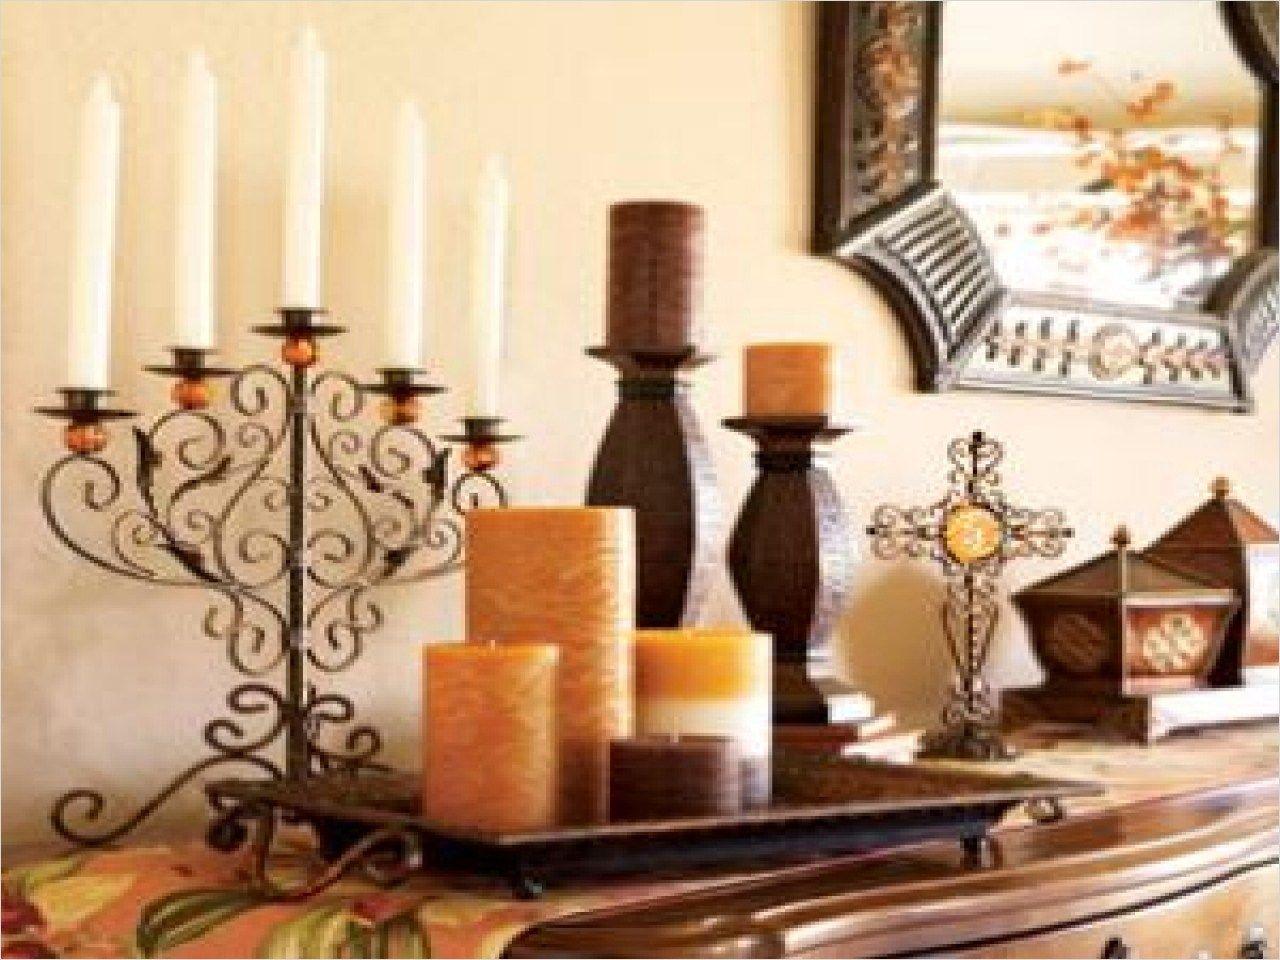 44 Elegant Home Decor Accents Ideas That Will Amaze You Elegant Home Decor Home Decor Accessories Fall Home Decor